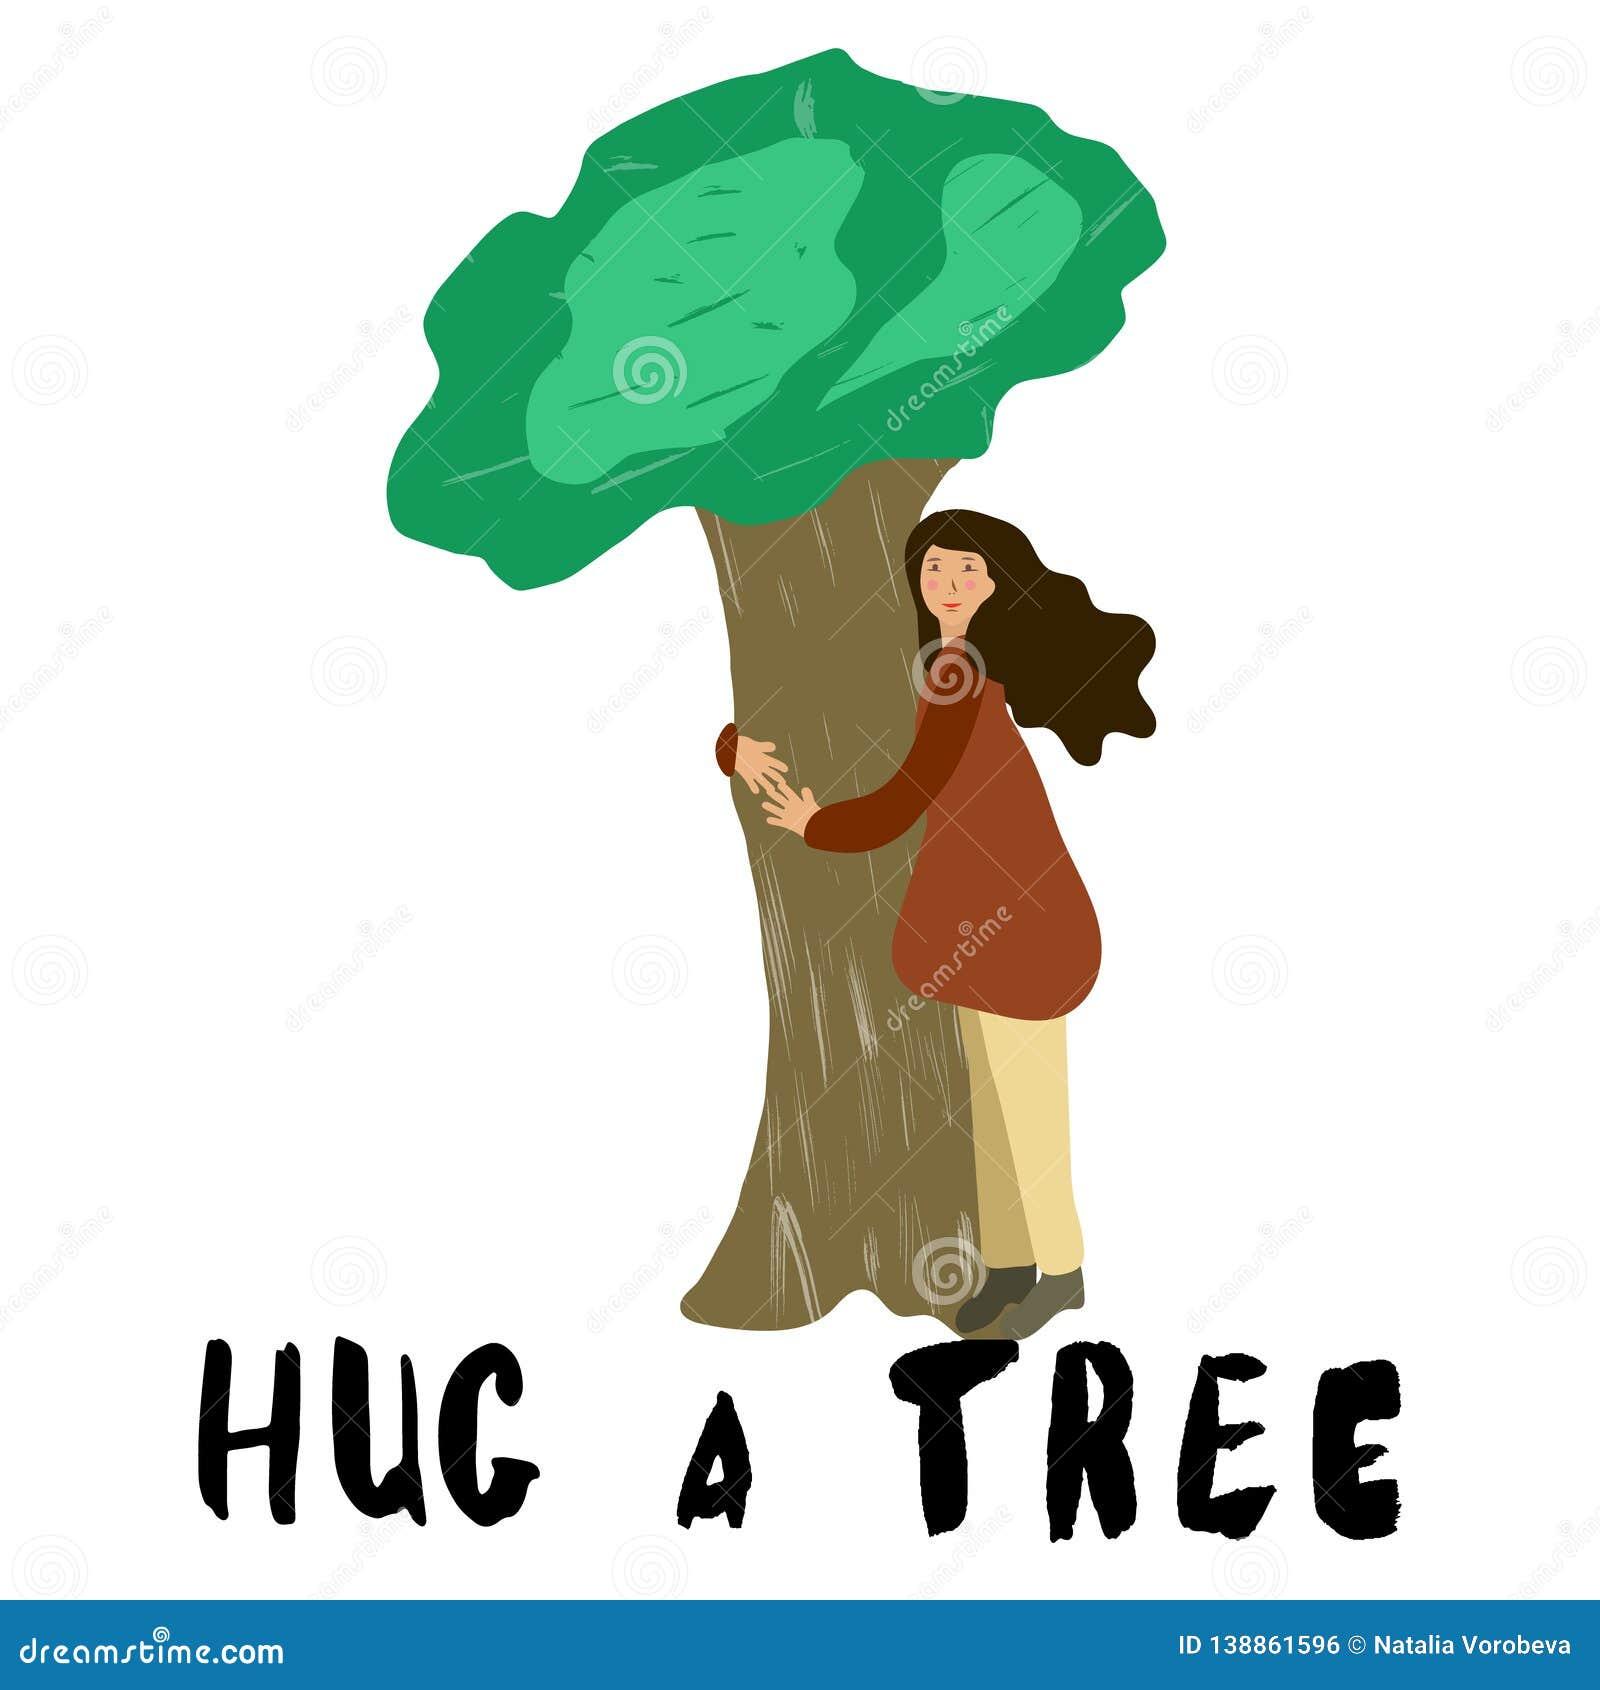 woman-hugging-tree-illustration-white-background-handwritten-note-hug-tree-hugging-tree-young-girl-138861596.jpg